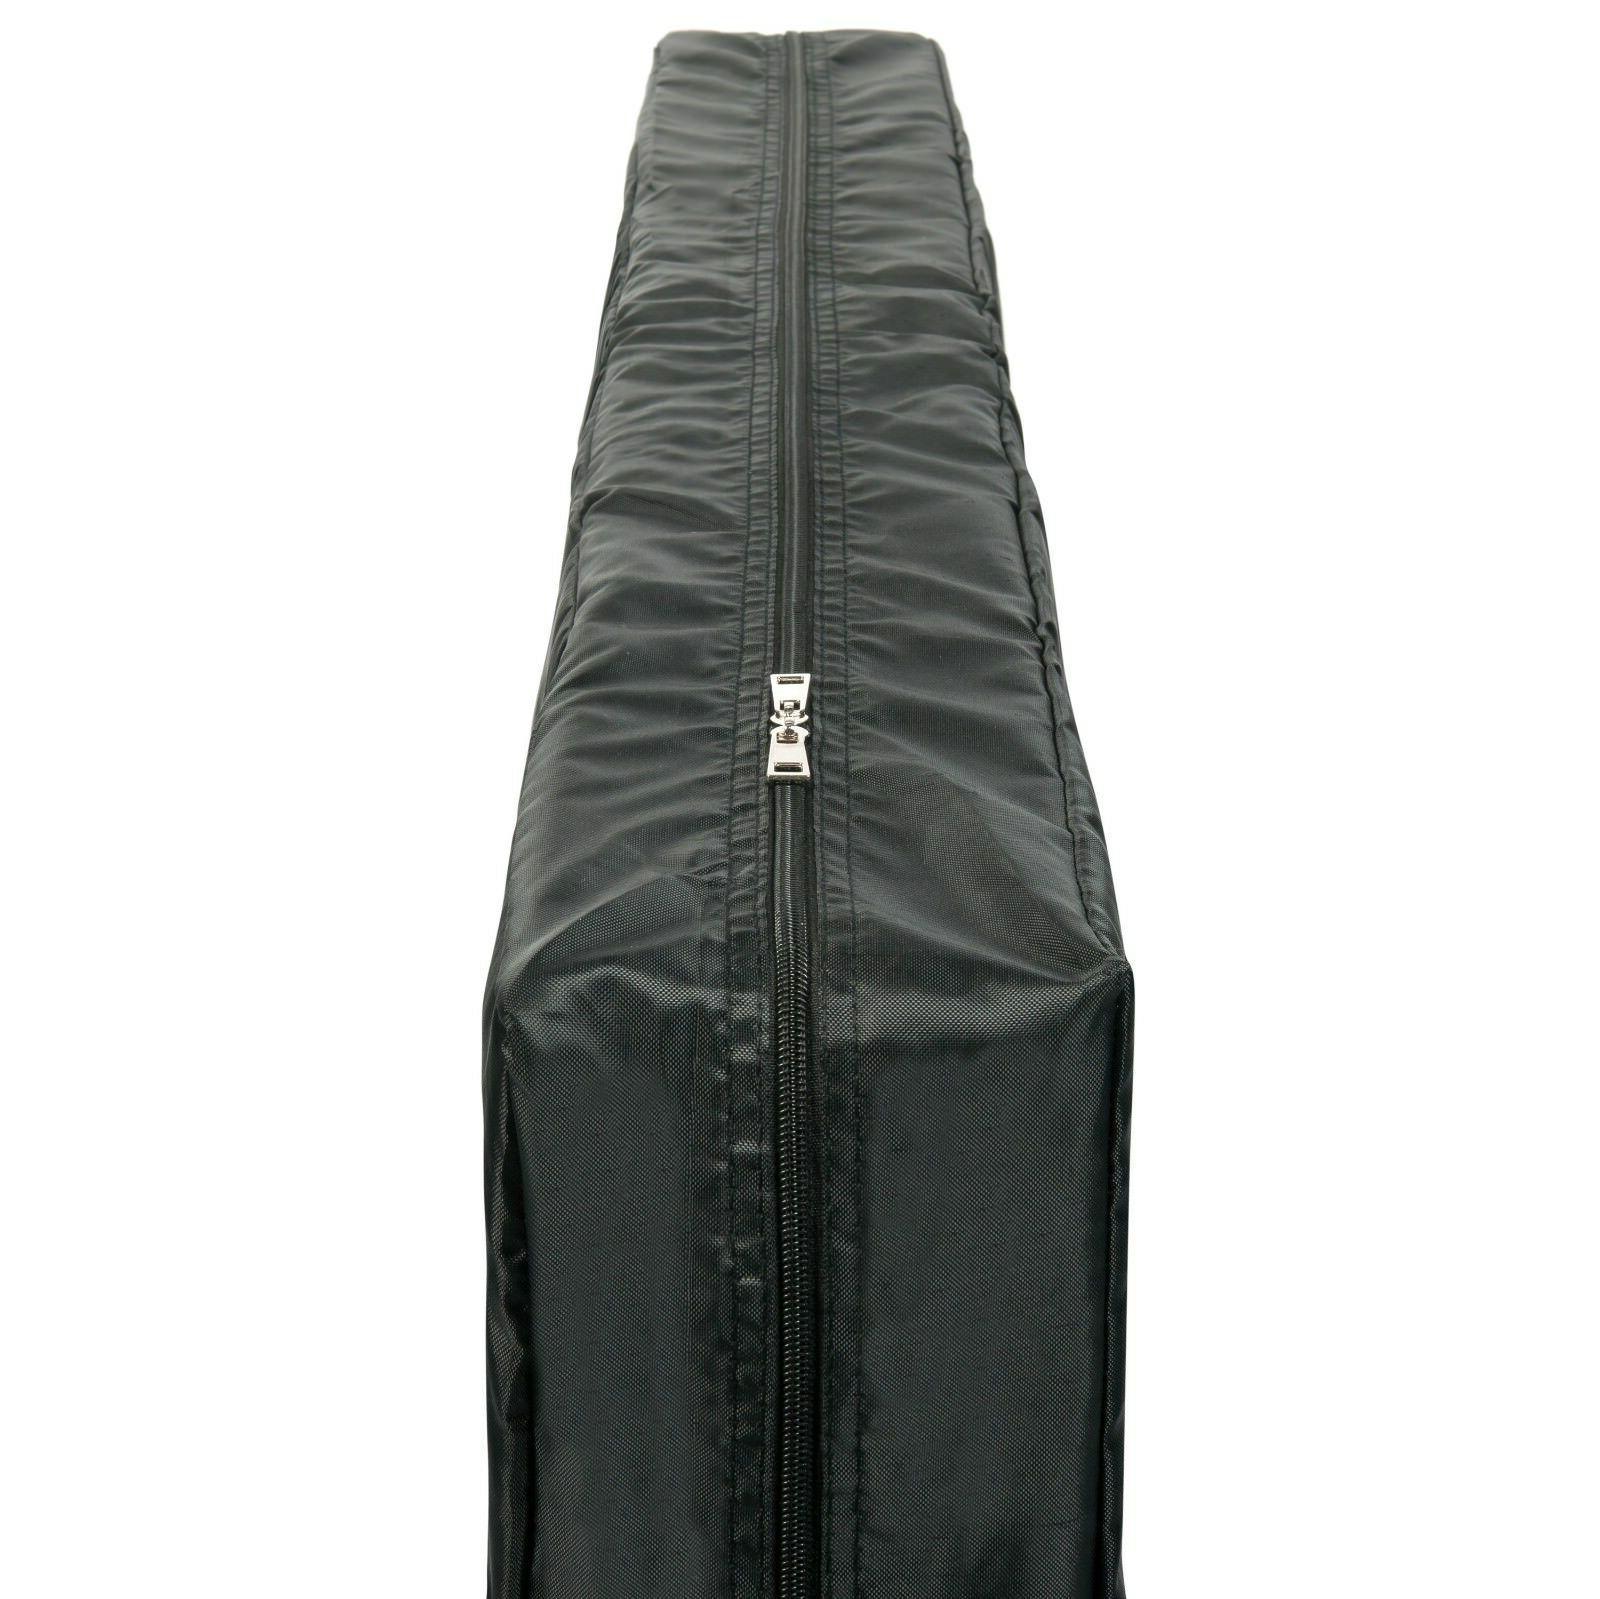 Tailgating Board Bag